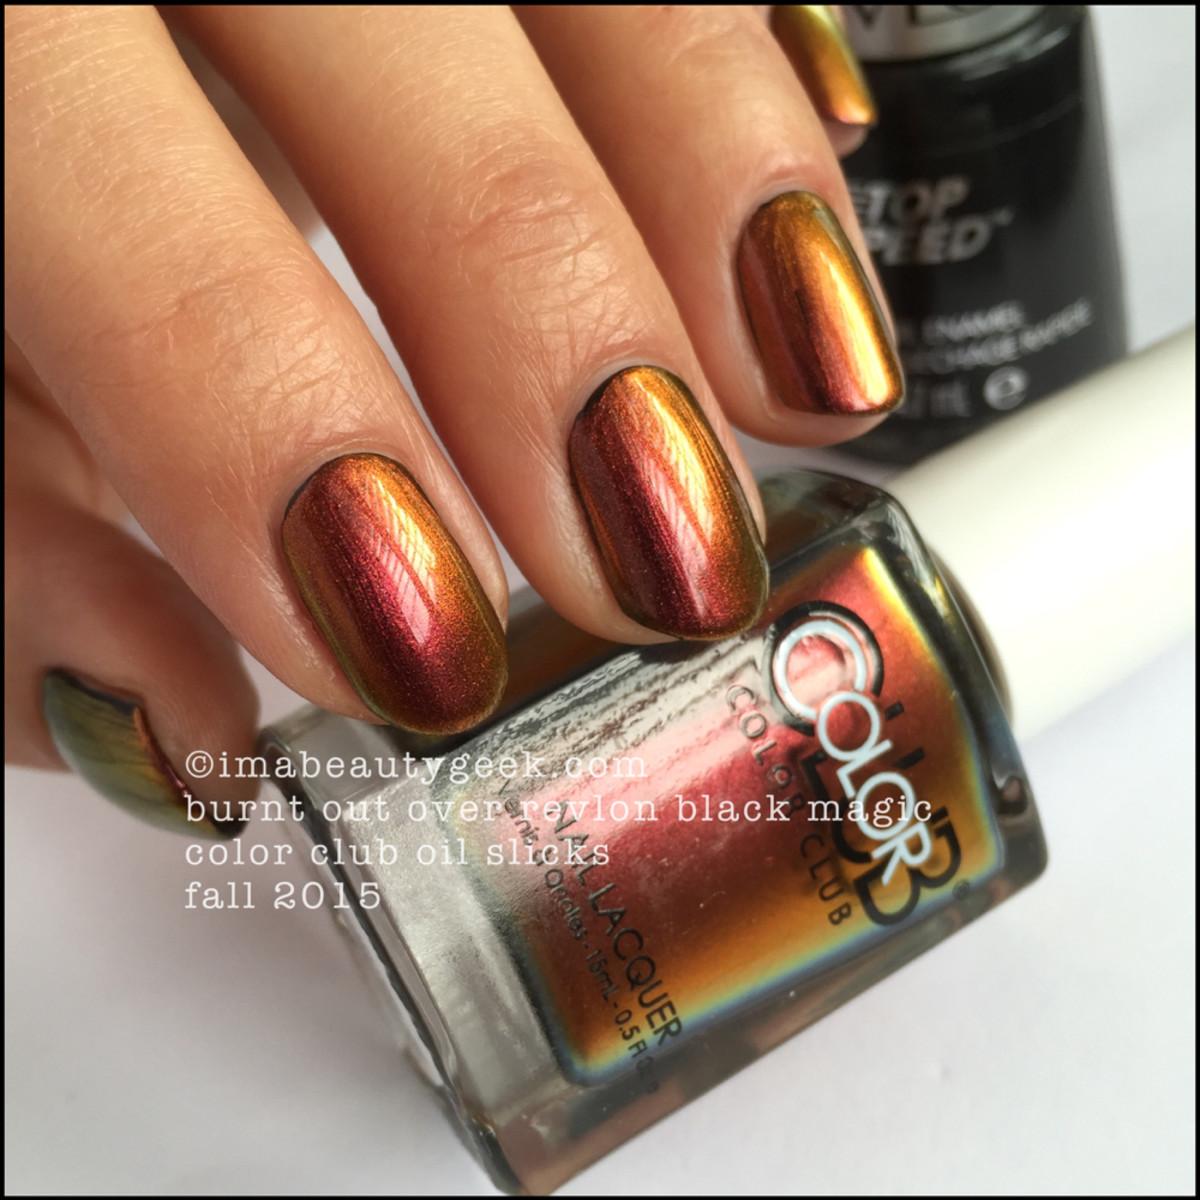 Color Club Oil Slicks_Color Club Burnt Out over Black_7